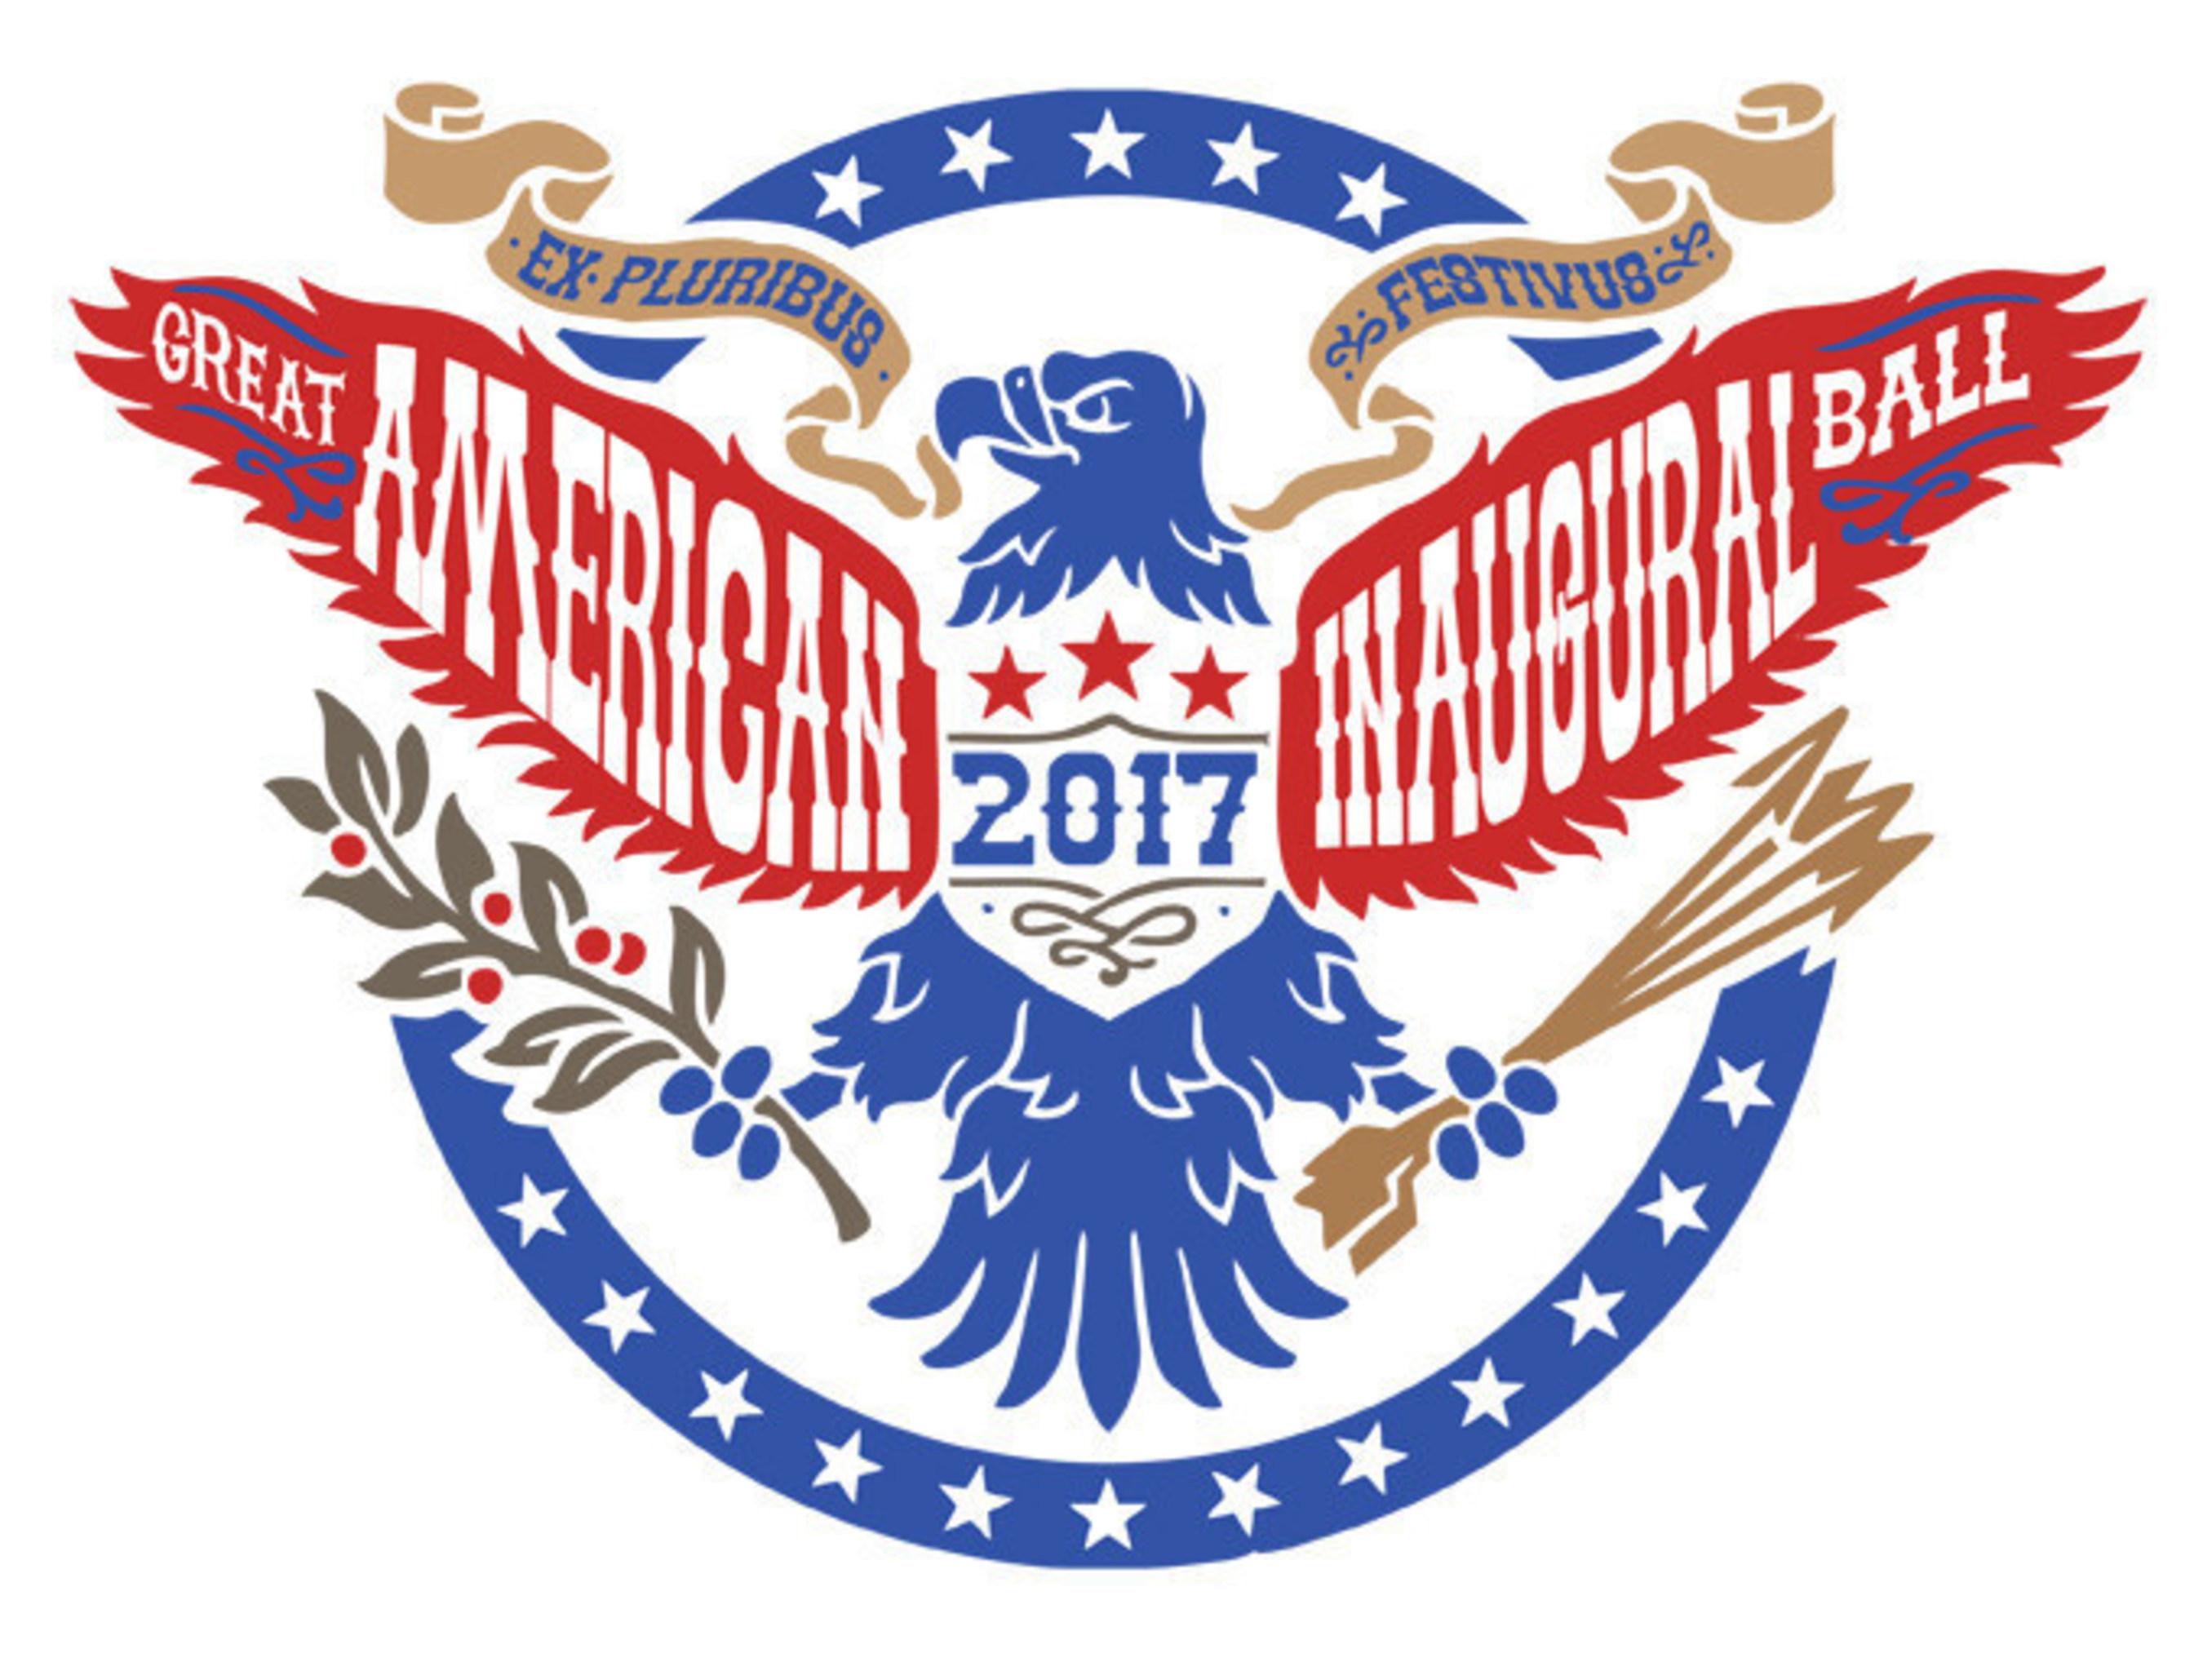 Great American Inaugural Ball 2017